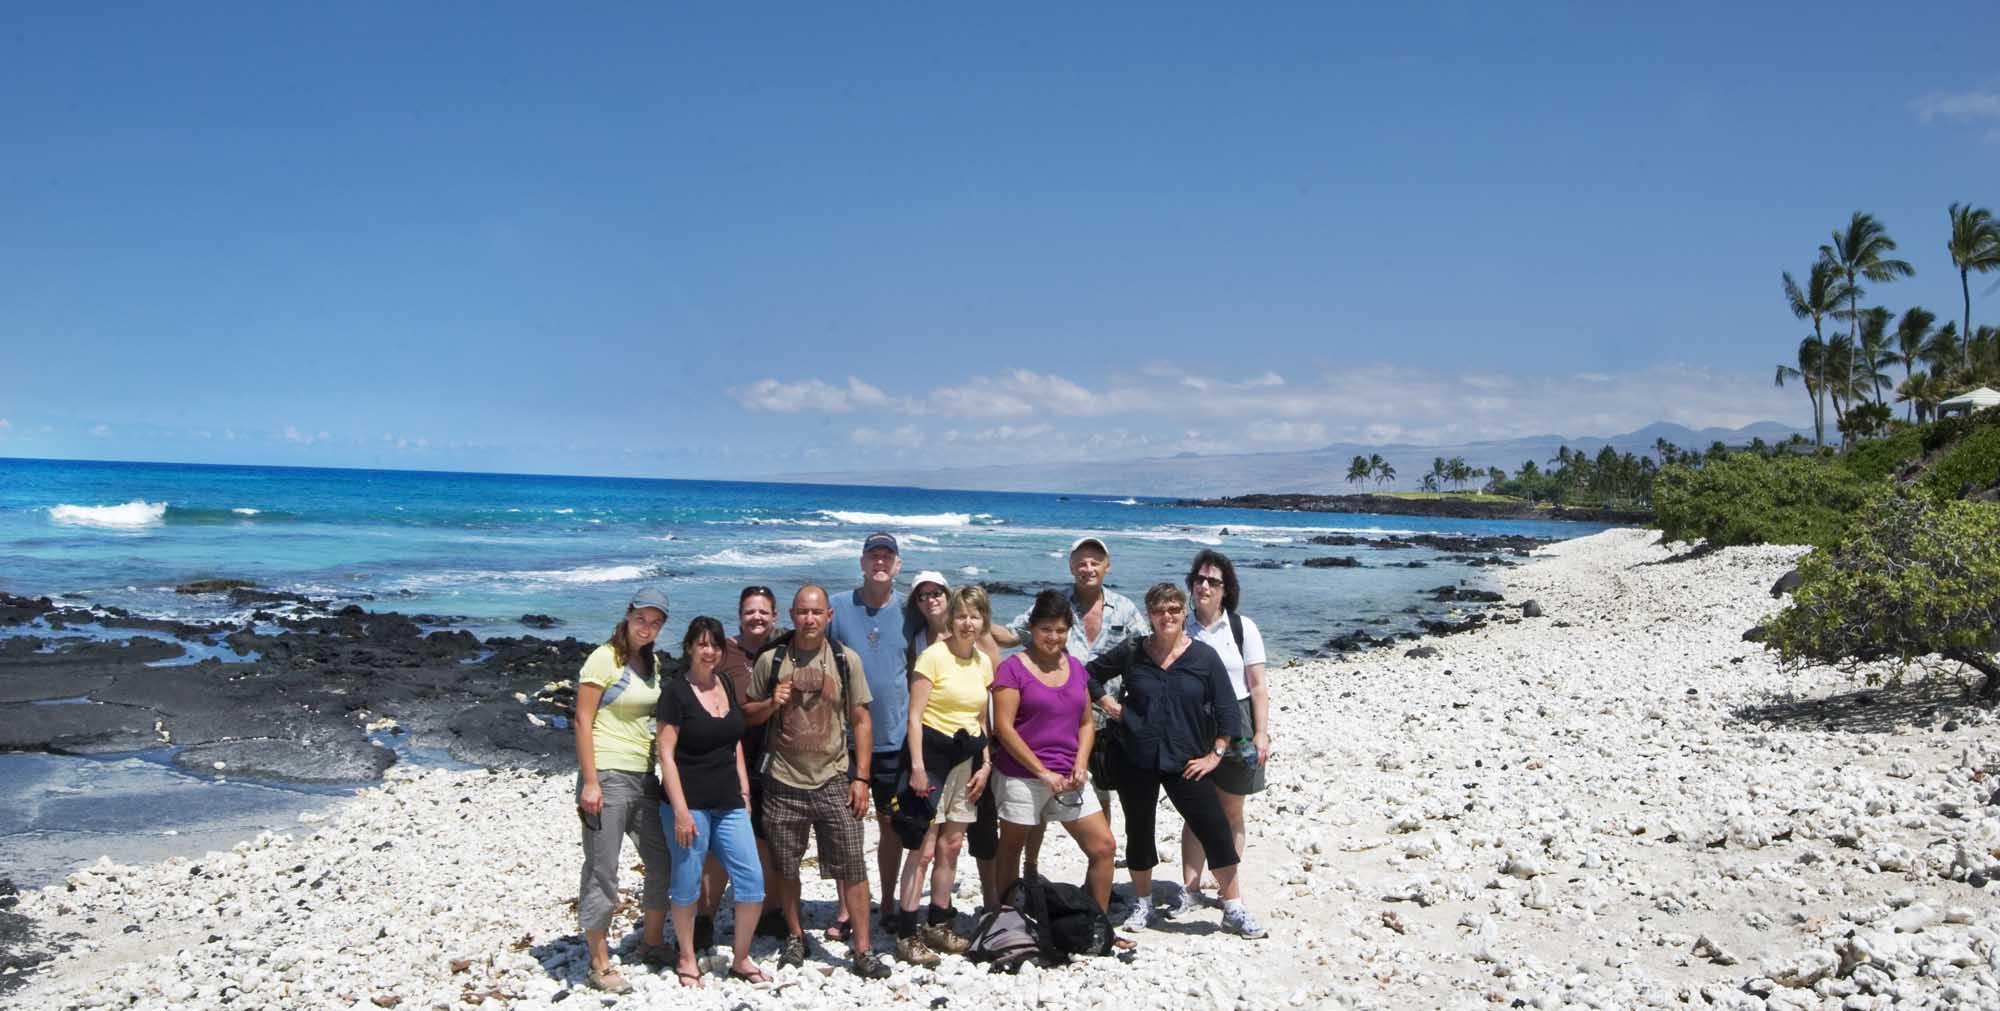 PhotoFly Travel Club   Group pan wp   PhotoFly Travel Club